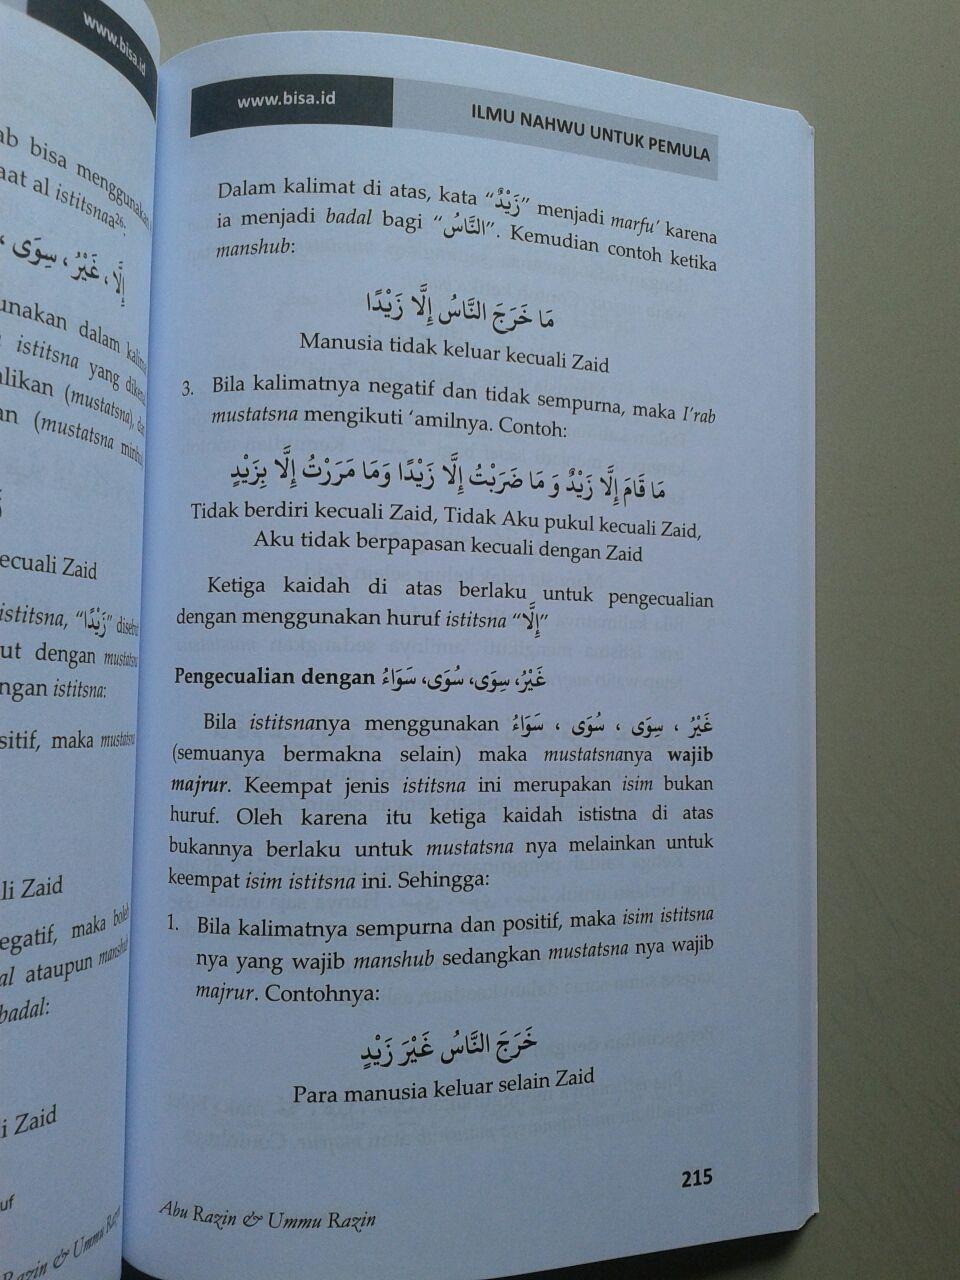 Buku Ilmu Nahwu Untuk Pemula isi 4